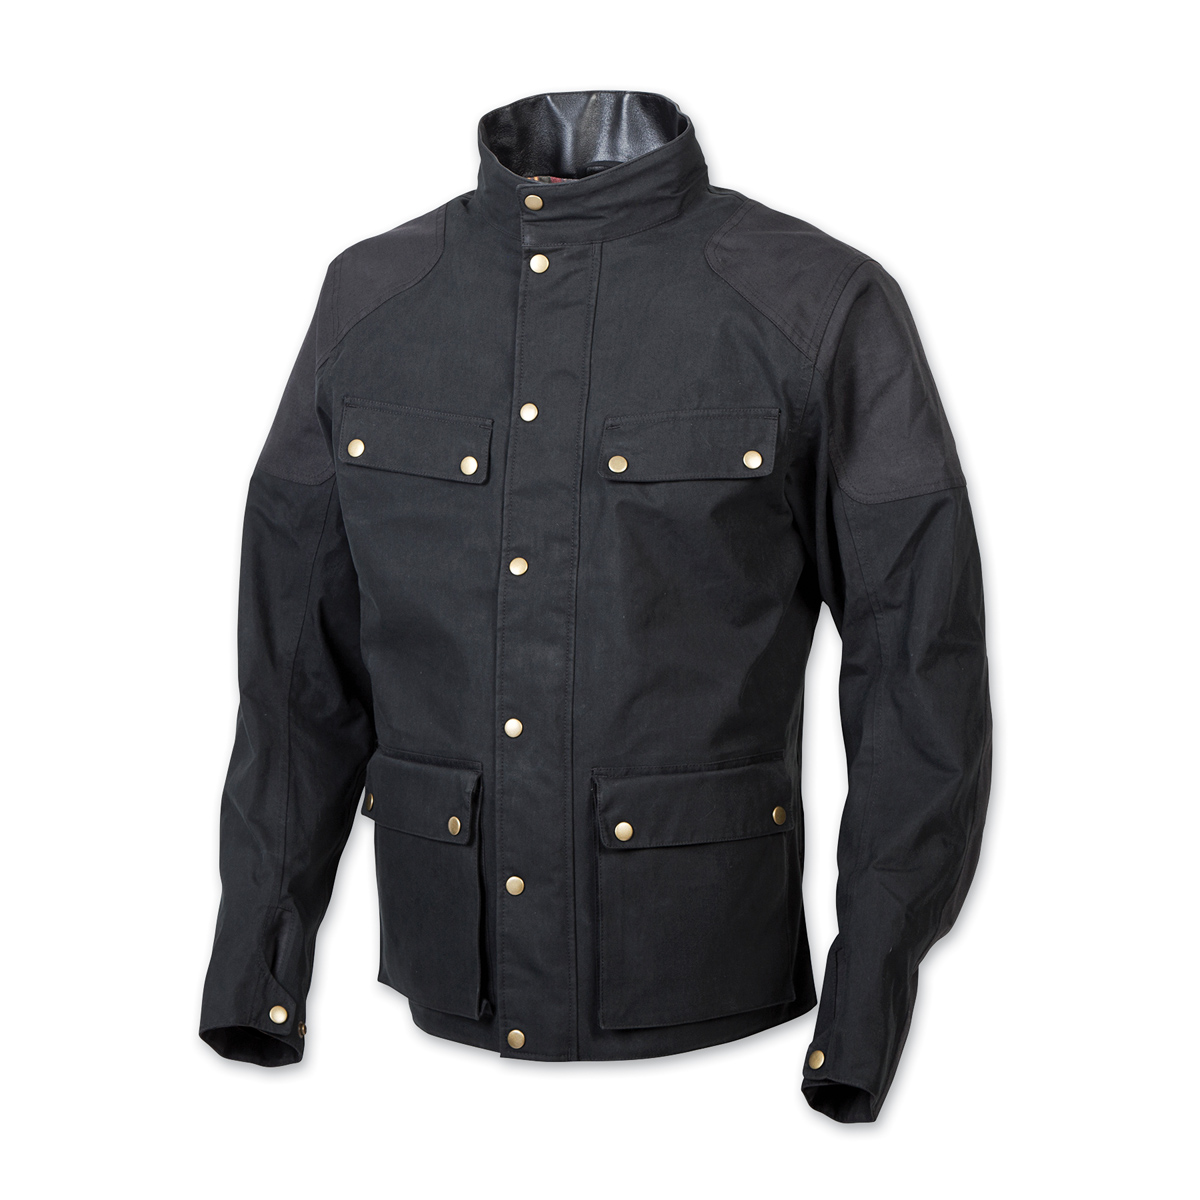 Scorpion EXO Men's Birmingham Black Jacket